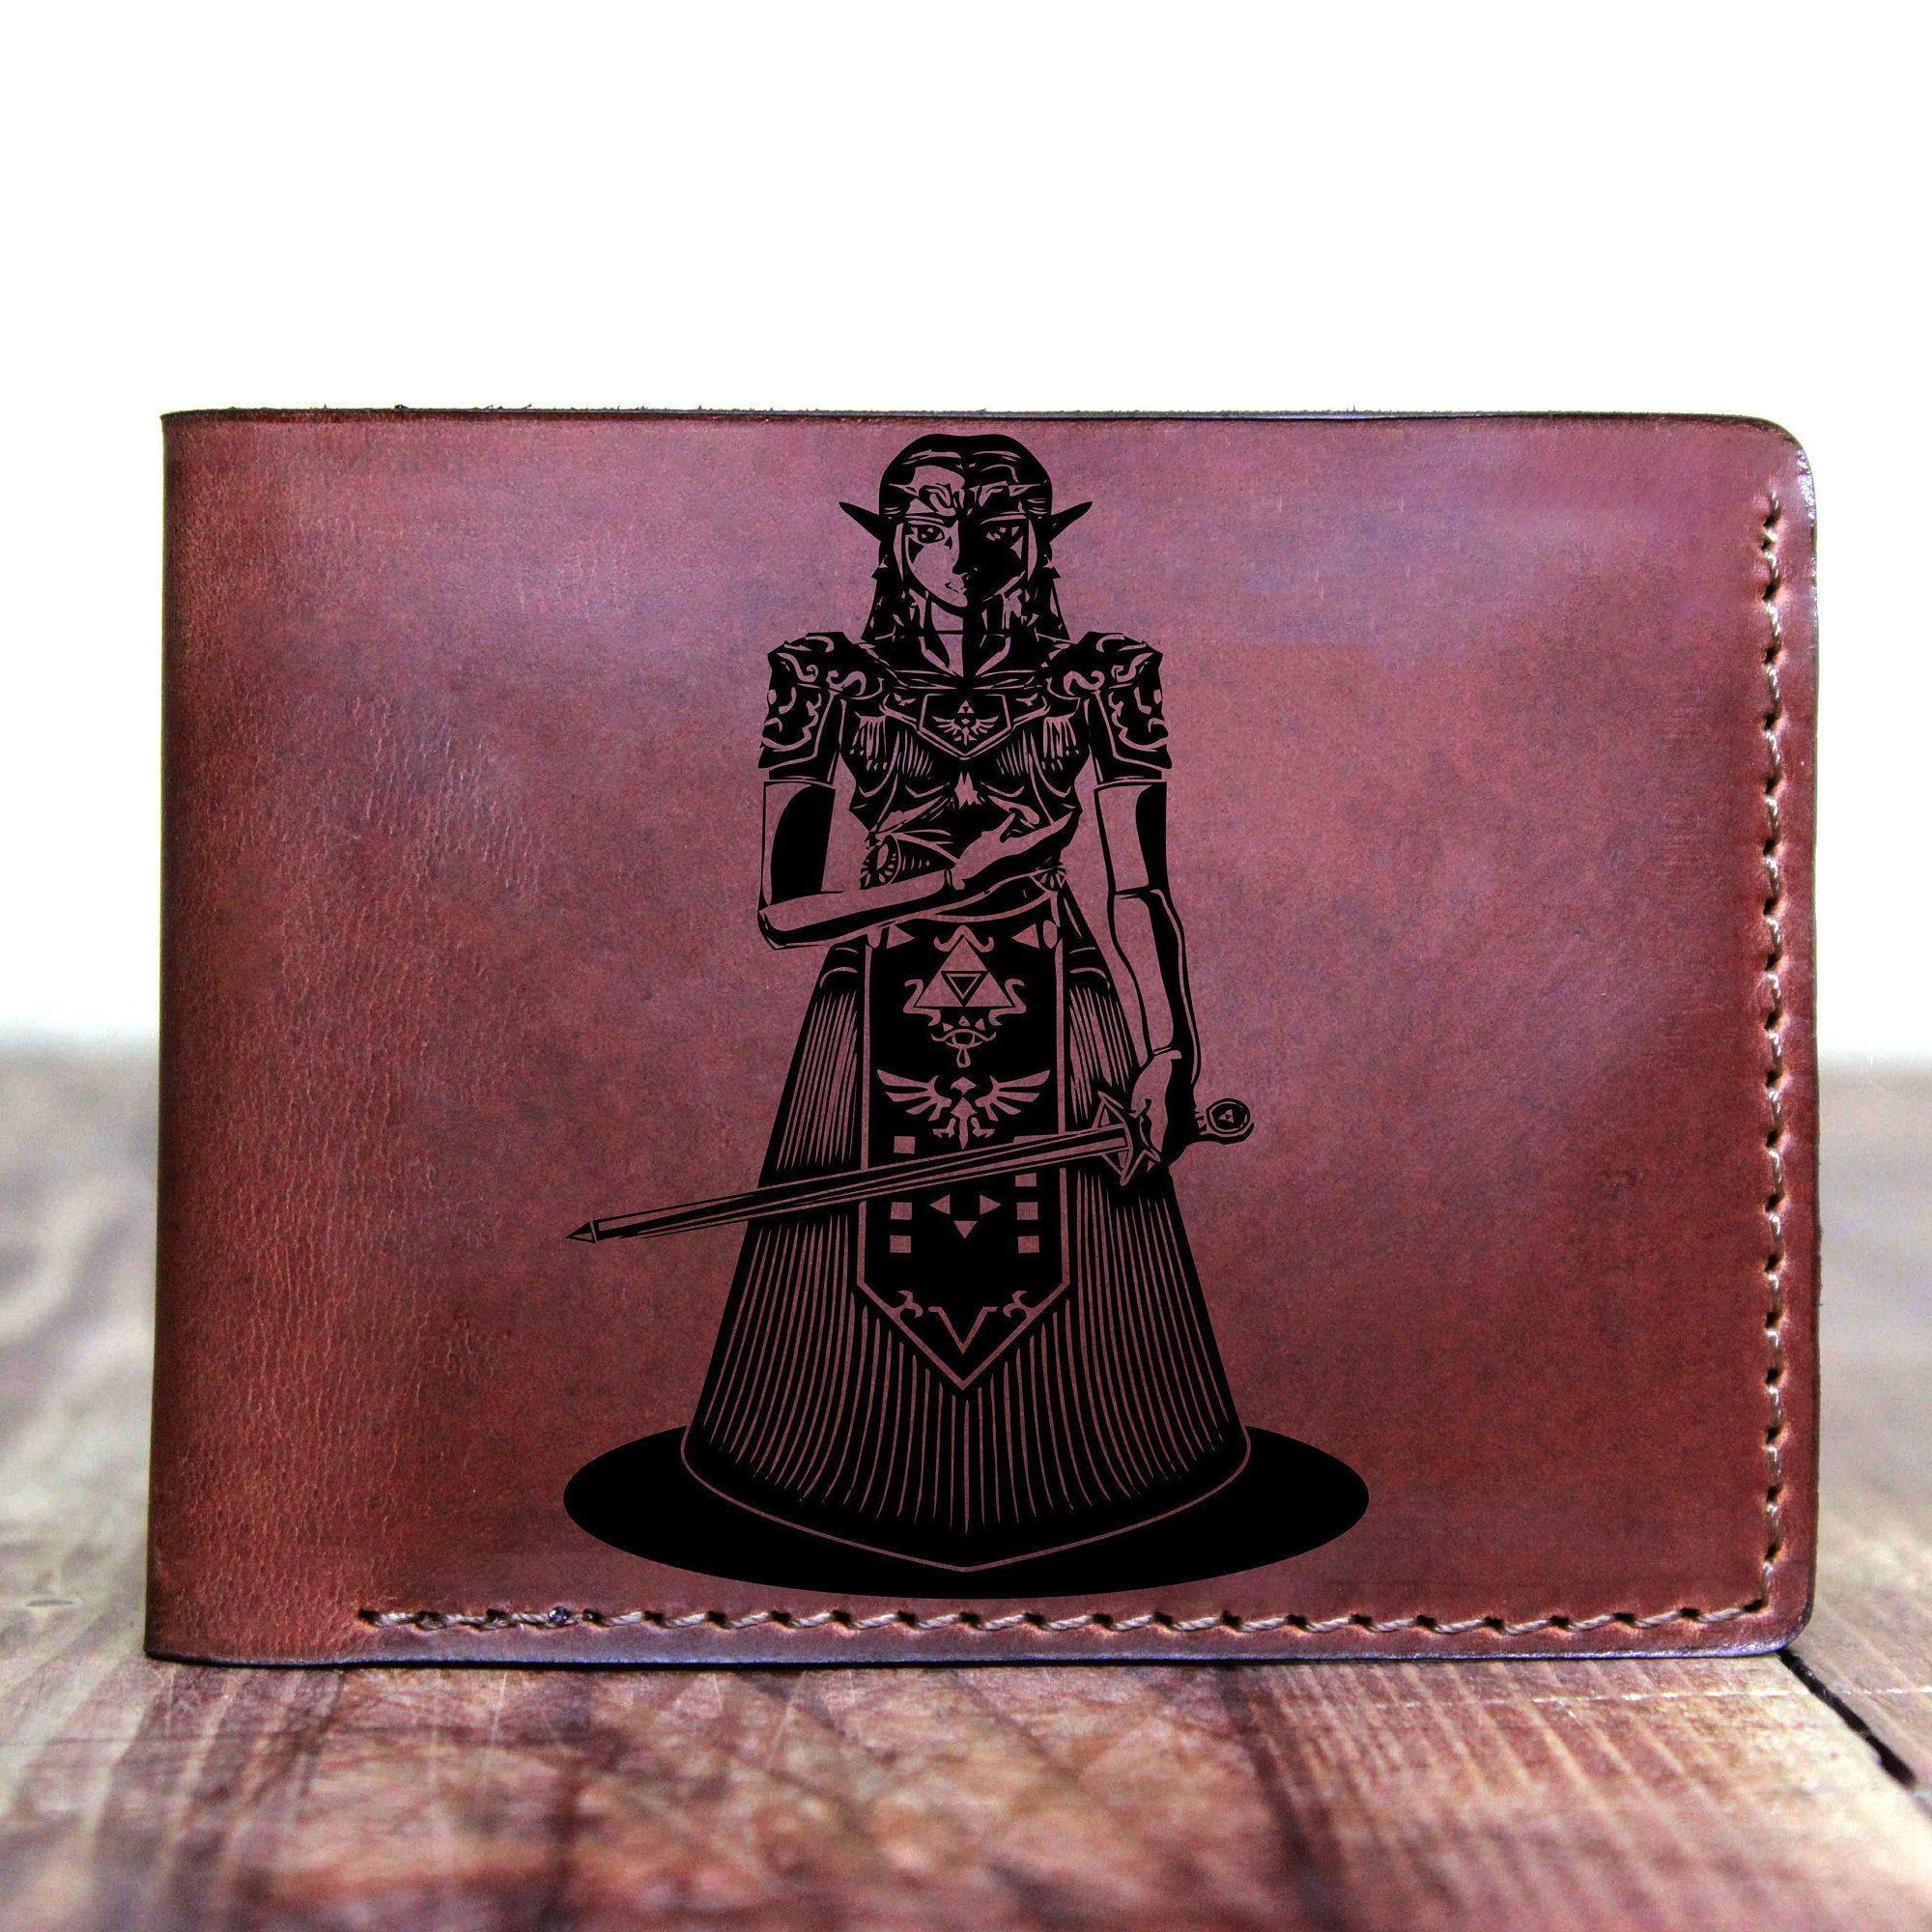 Princes of Zelda - leather custom bifold wallet, Zelda Man wallet, Triforce leather custom wallet, Personalized wallet, Man gift#bifold #custom #gift #leather #man #personalized #princes #triforce #wallet #zelda